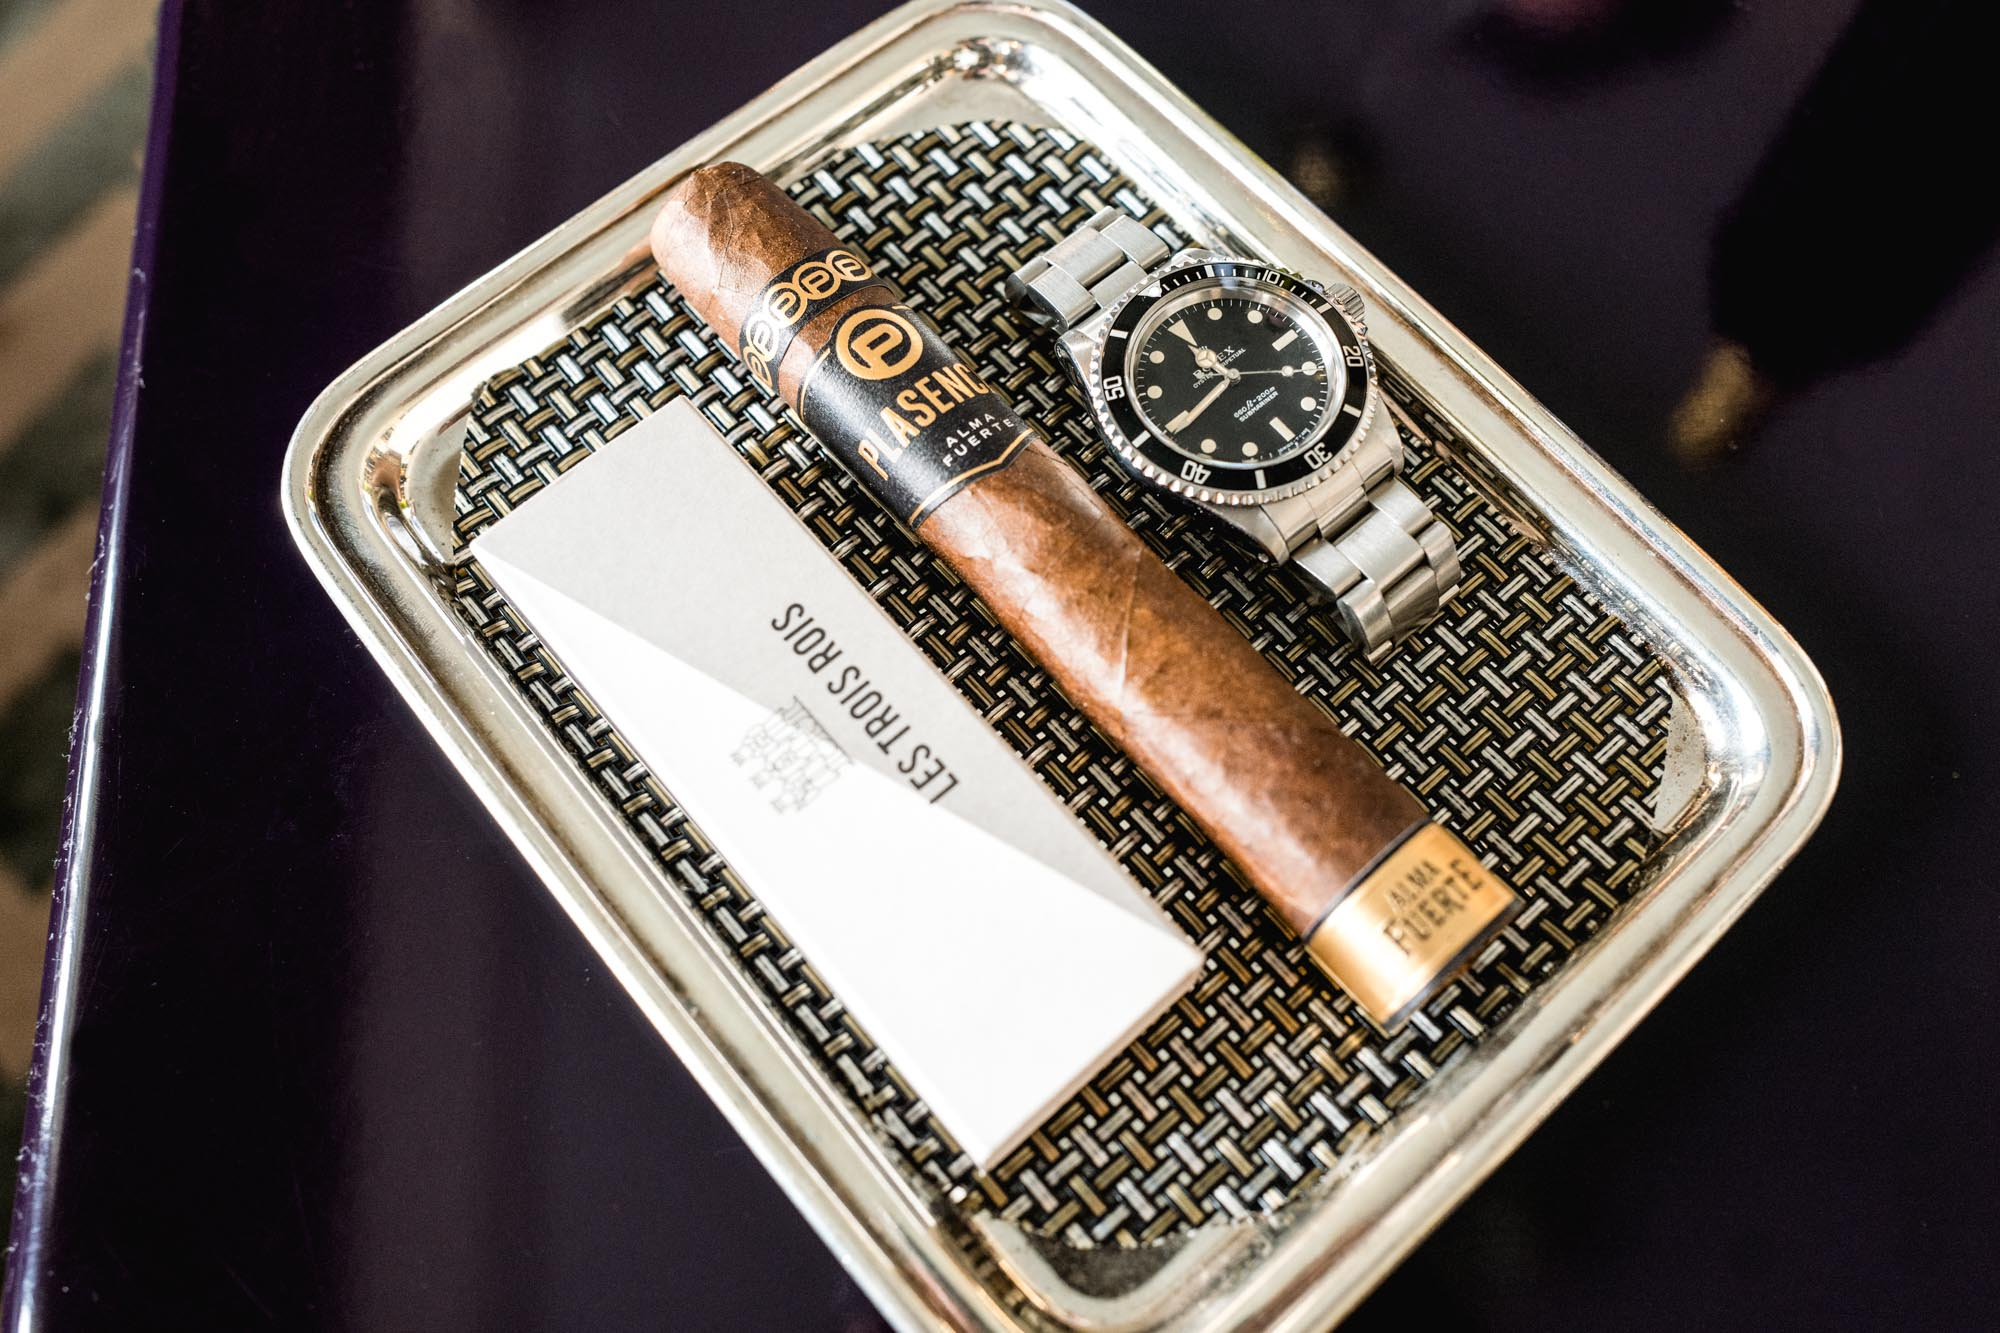 Accords cigares/spiritueux - Cigare Plasencia du Nicaragua